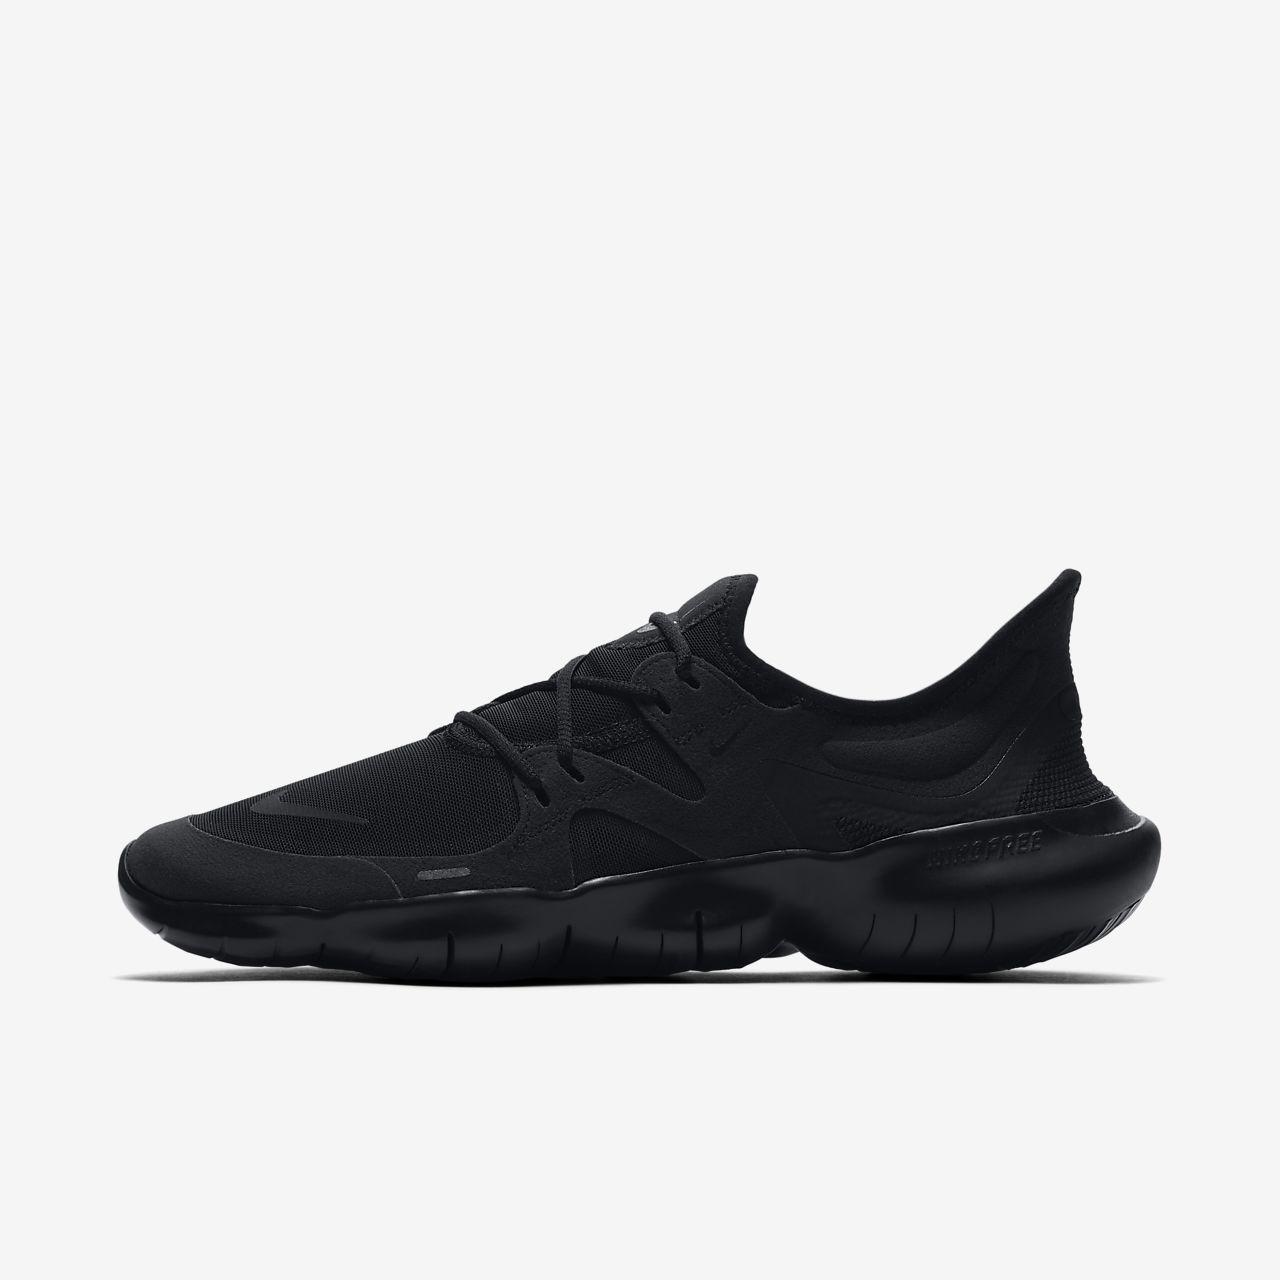 the best attitude fb994 f57e5 Nike Free RN 5.0 Men's Running Shoe